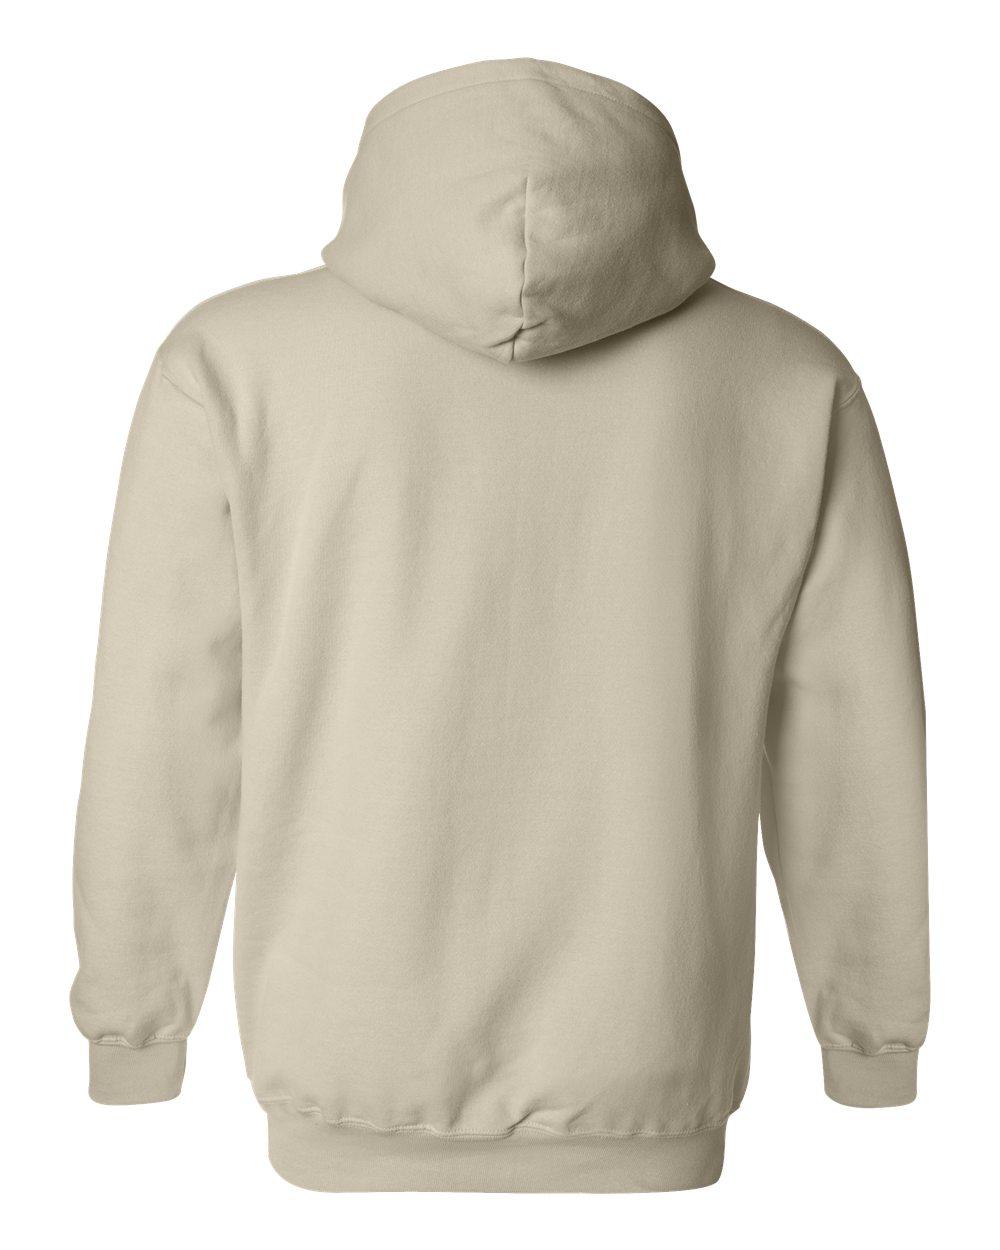 Gildan-Mens-Blank-Hoodie-Heavy-Blend-Hooded-Sweatshirt-Solid-18500-up-to-5XL thumbnail 90